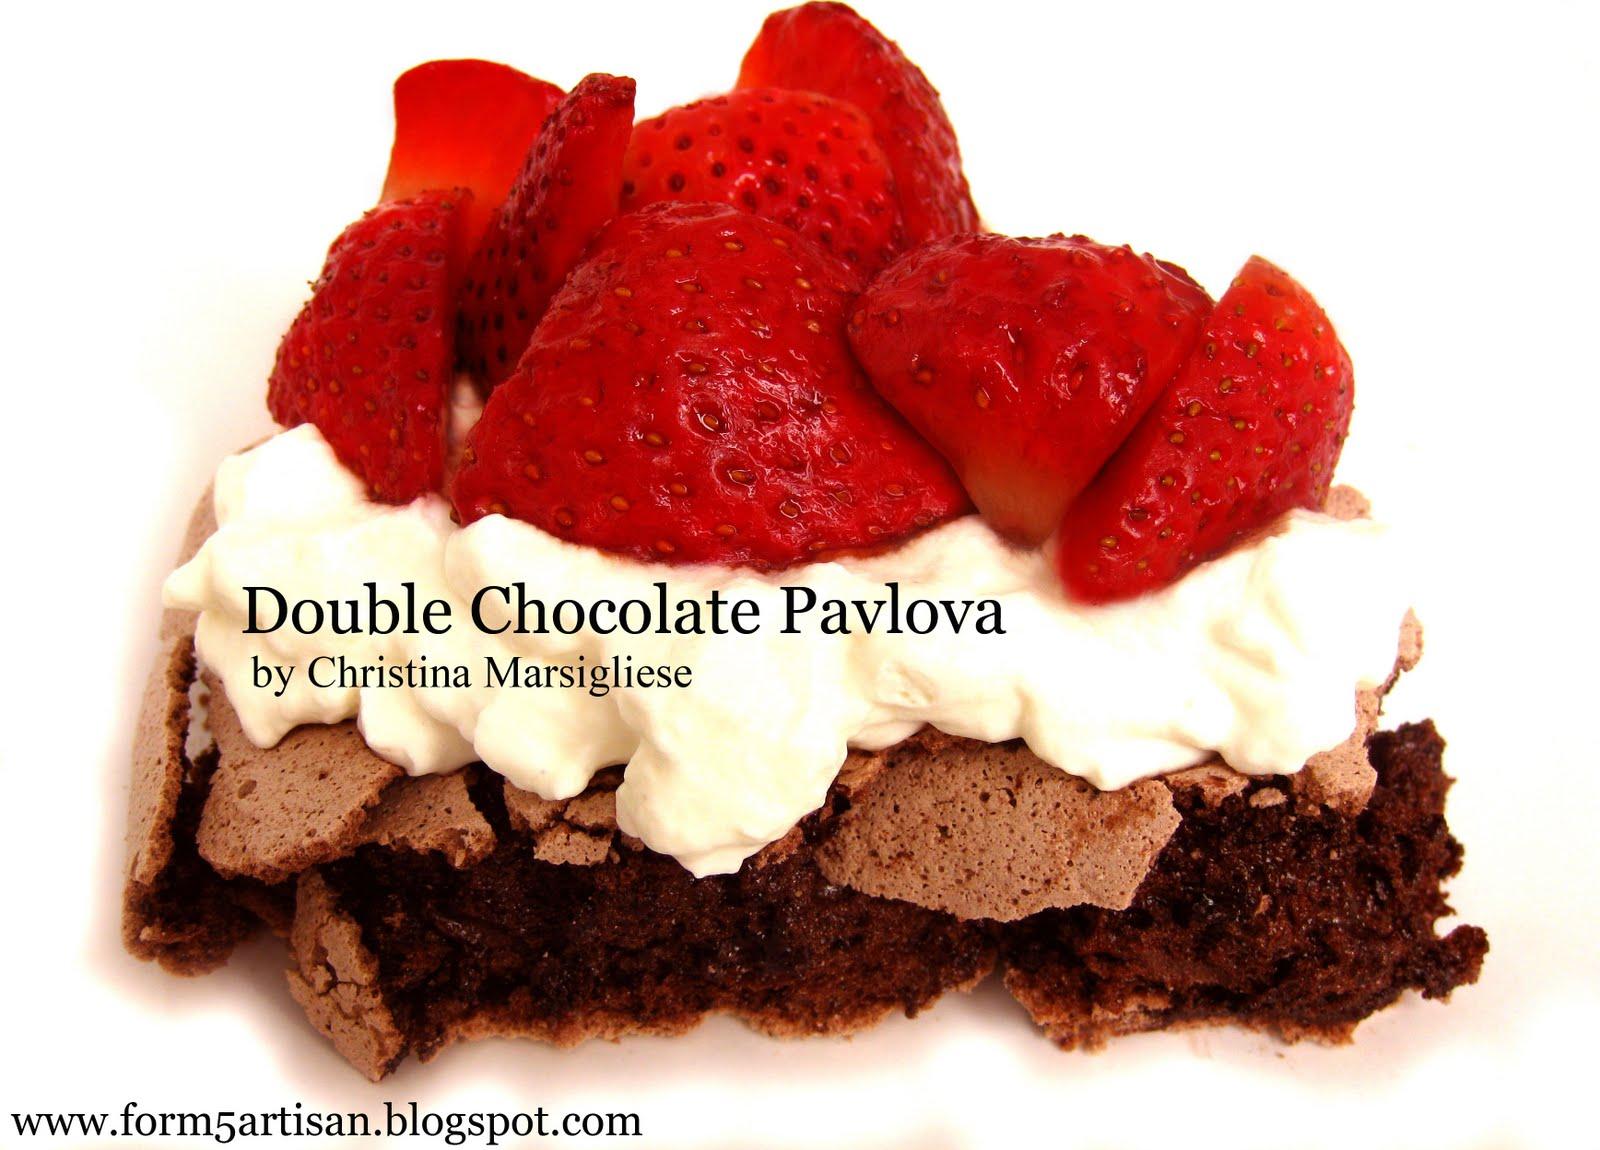 Scientifically Sweet: Double Chocolate Pavlova